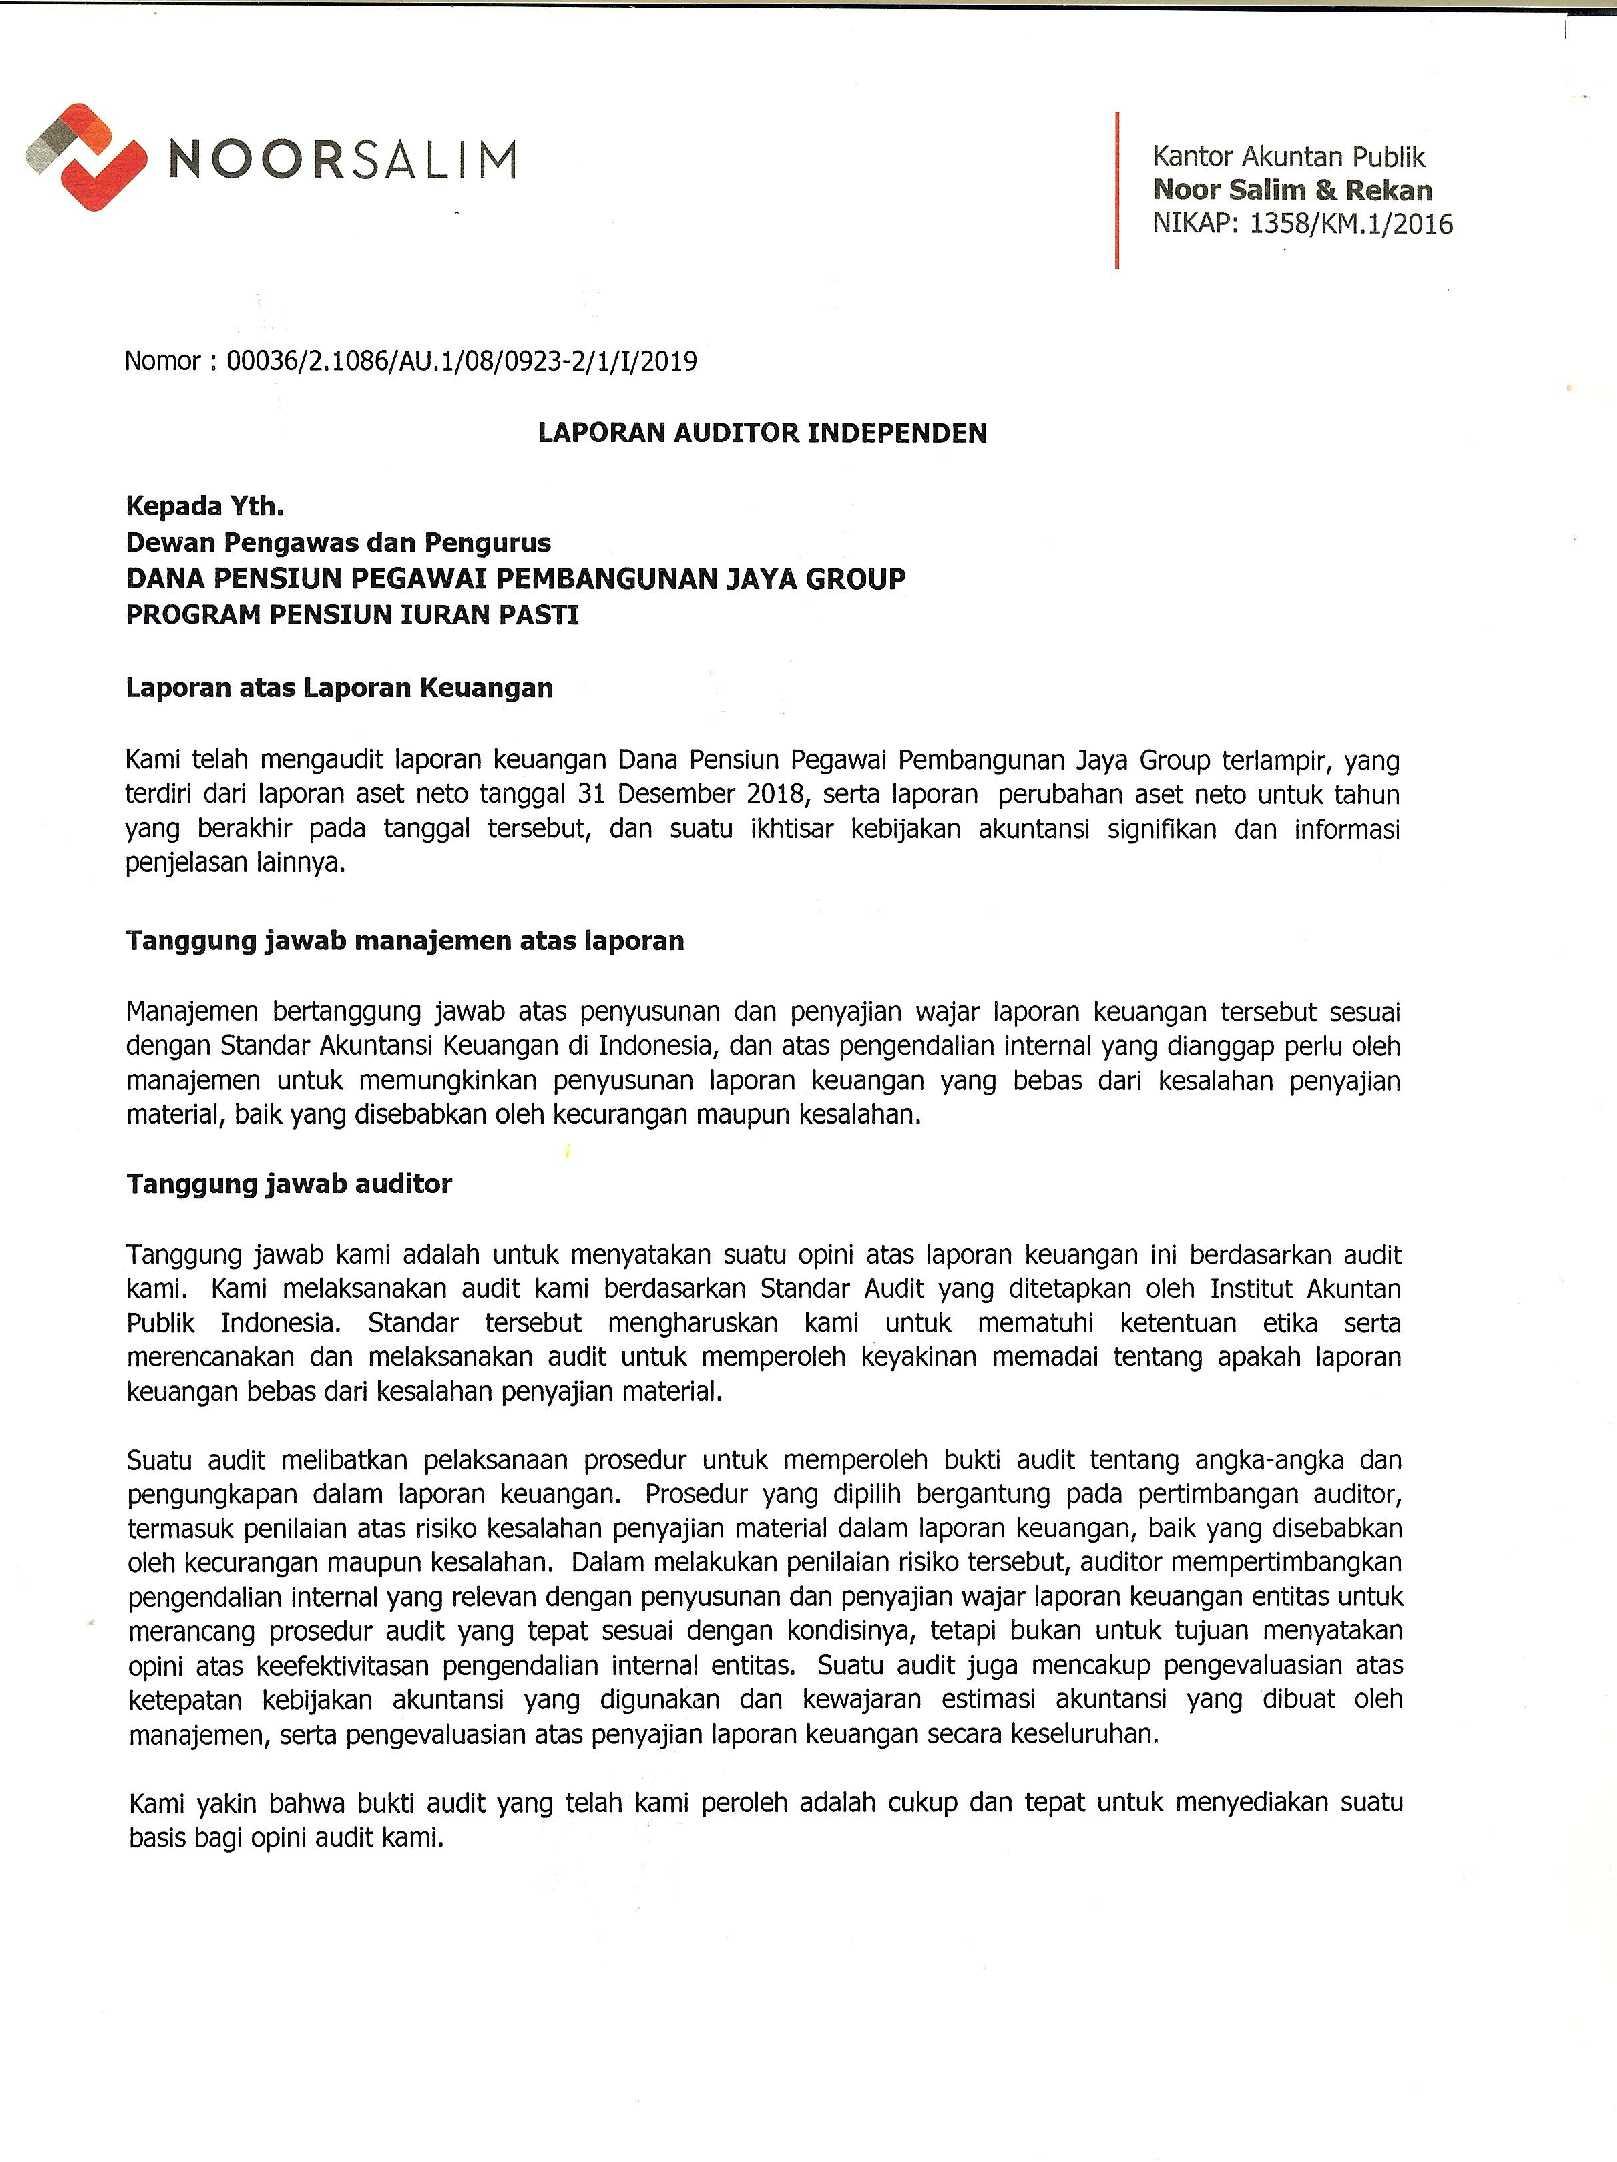 Laporan Hasil Audit Dana Pensiun Pembangunan Jaya Group